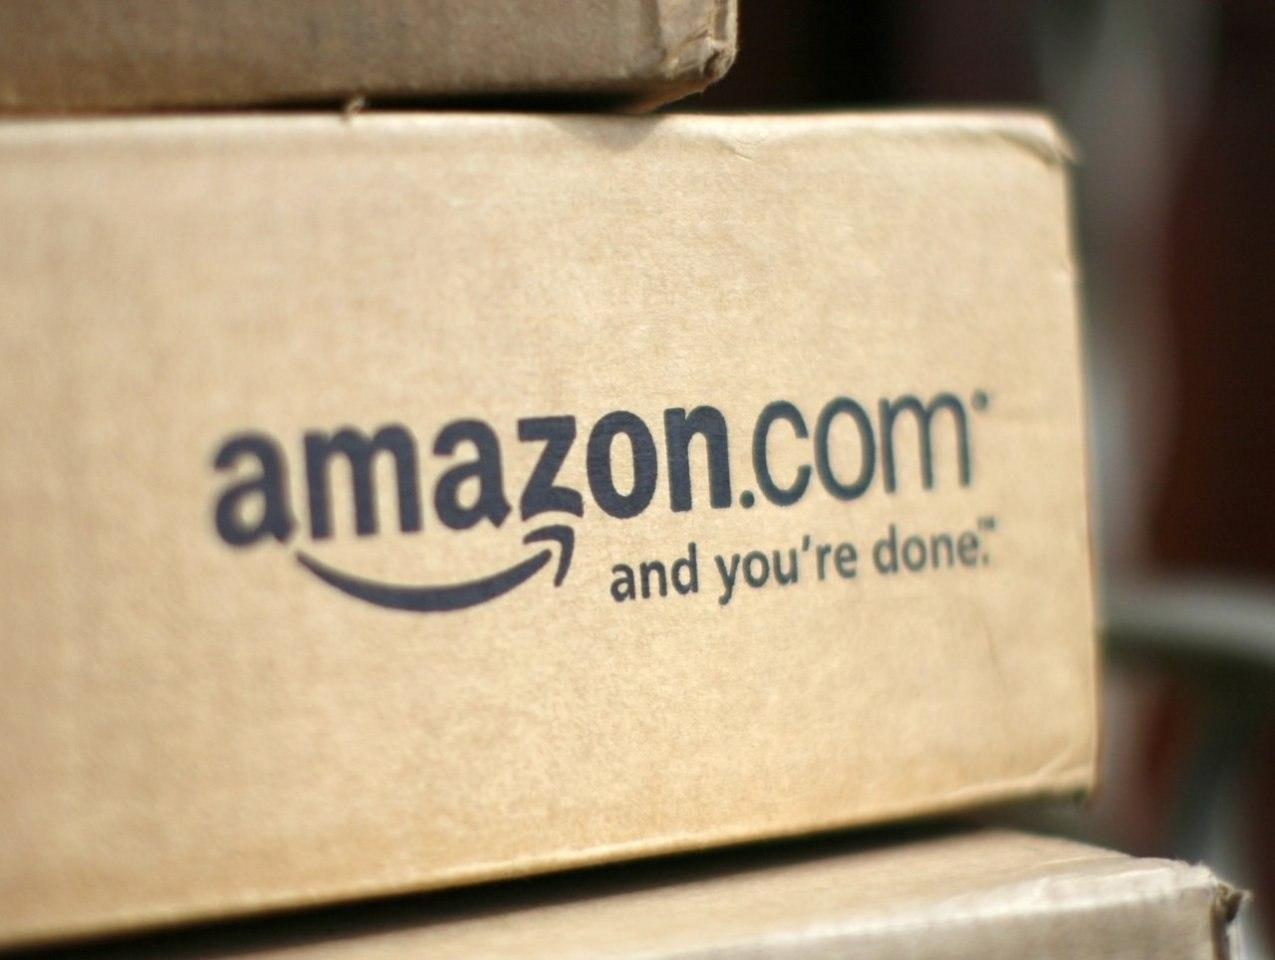 Глава Amazon стал самым богатым человеком в мире